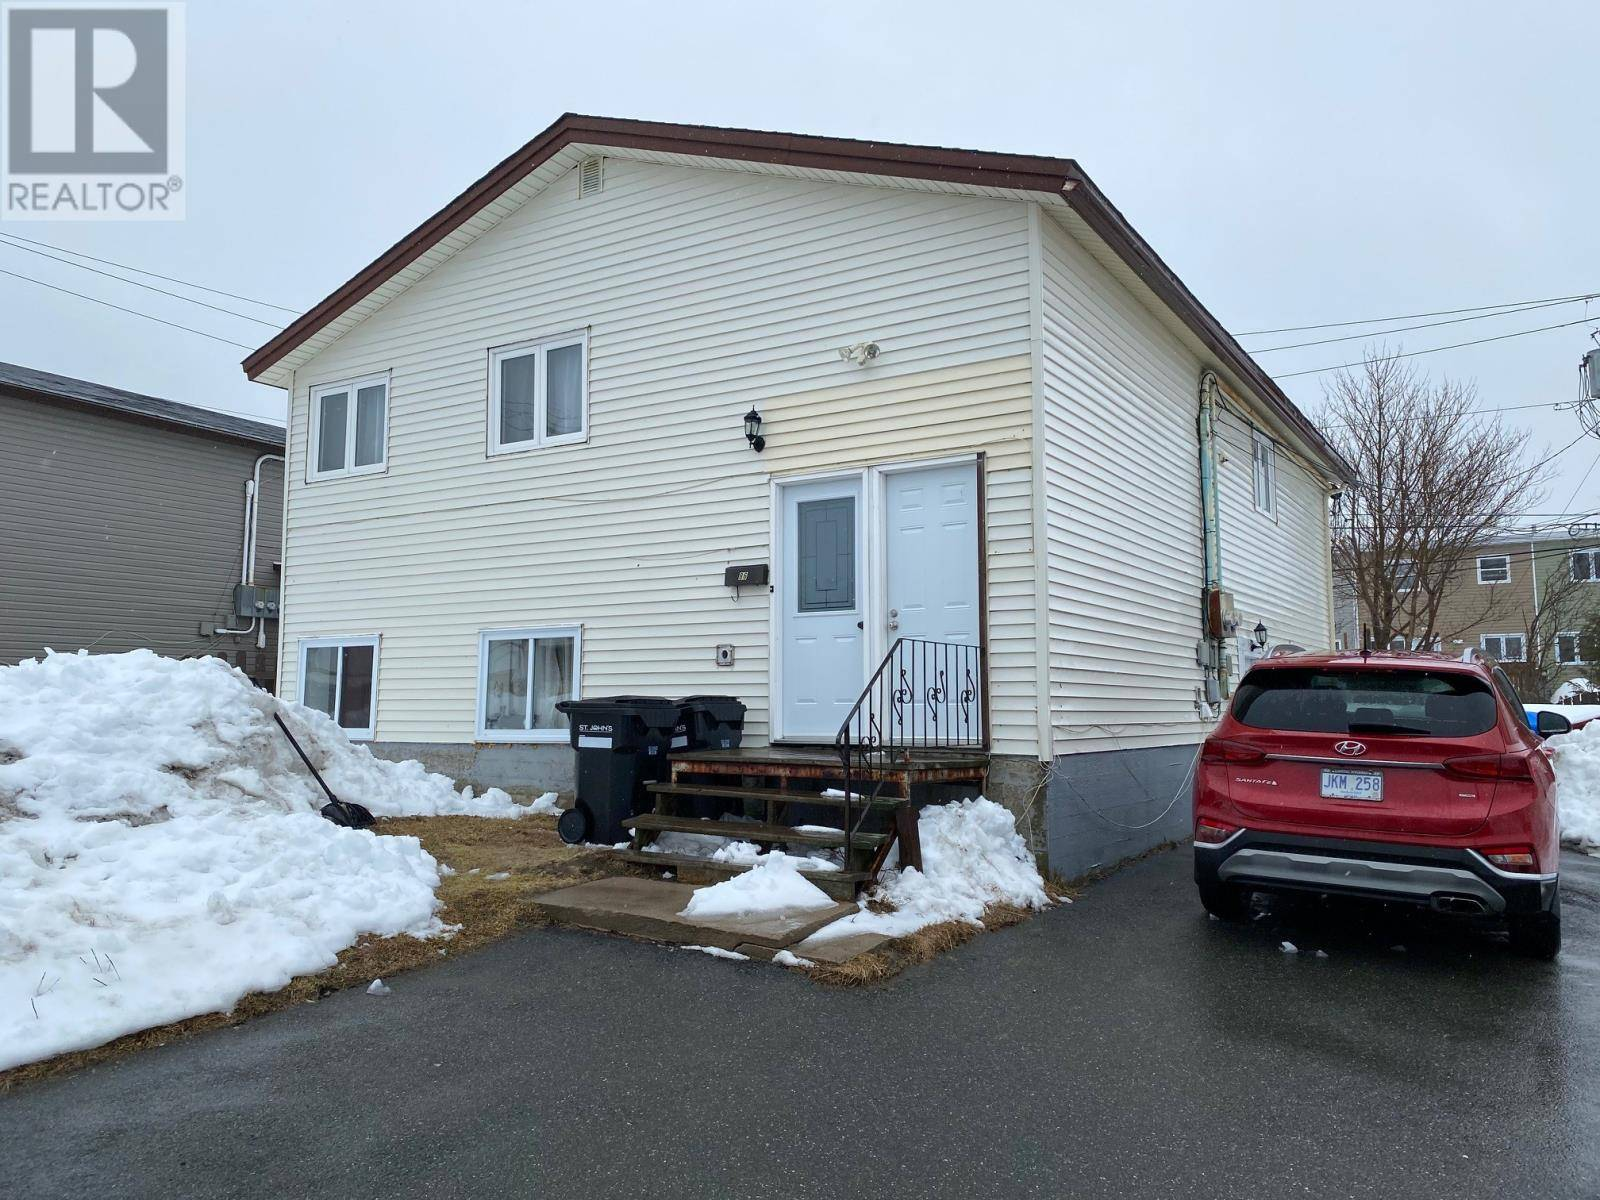 Residential property for sale at 86 Hamlyn Rd St. John's Newfoundland - MLS: 1212538